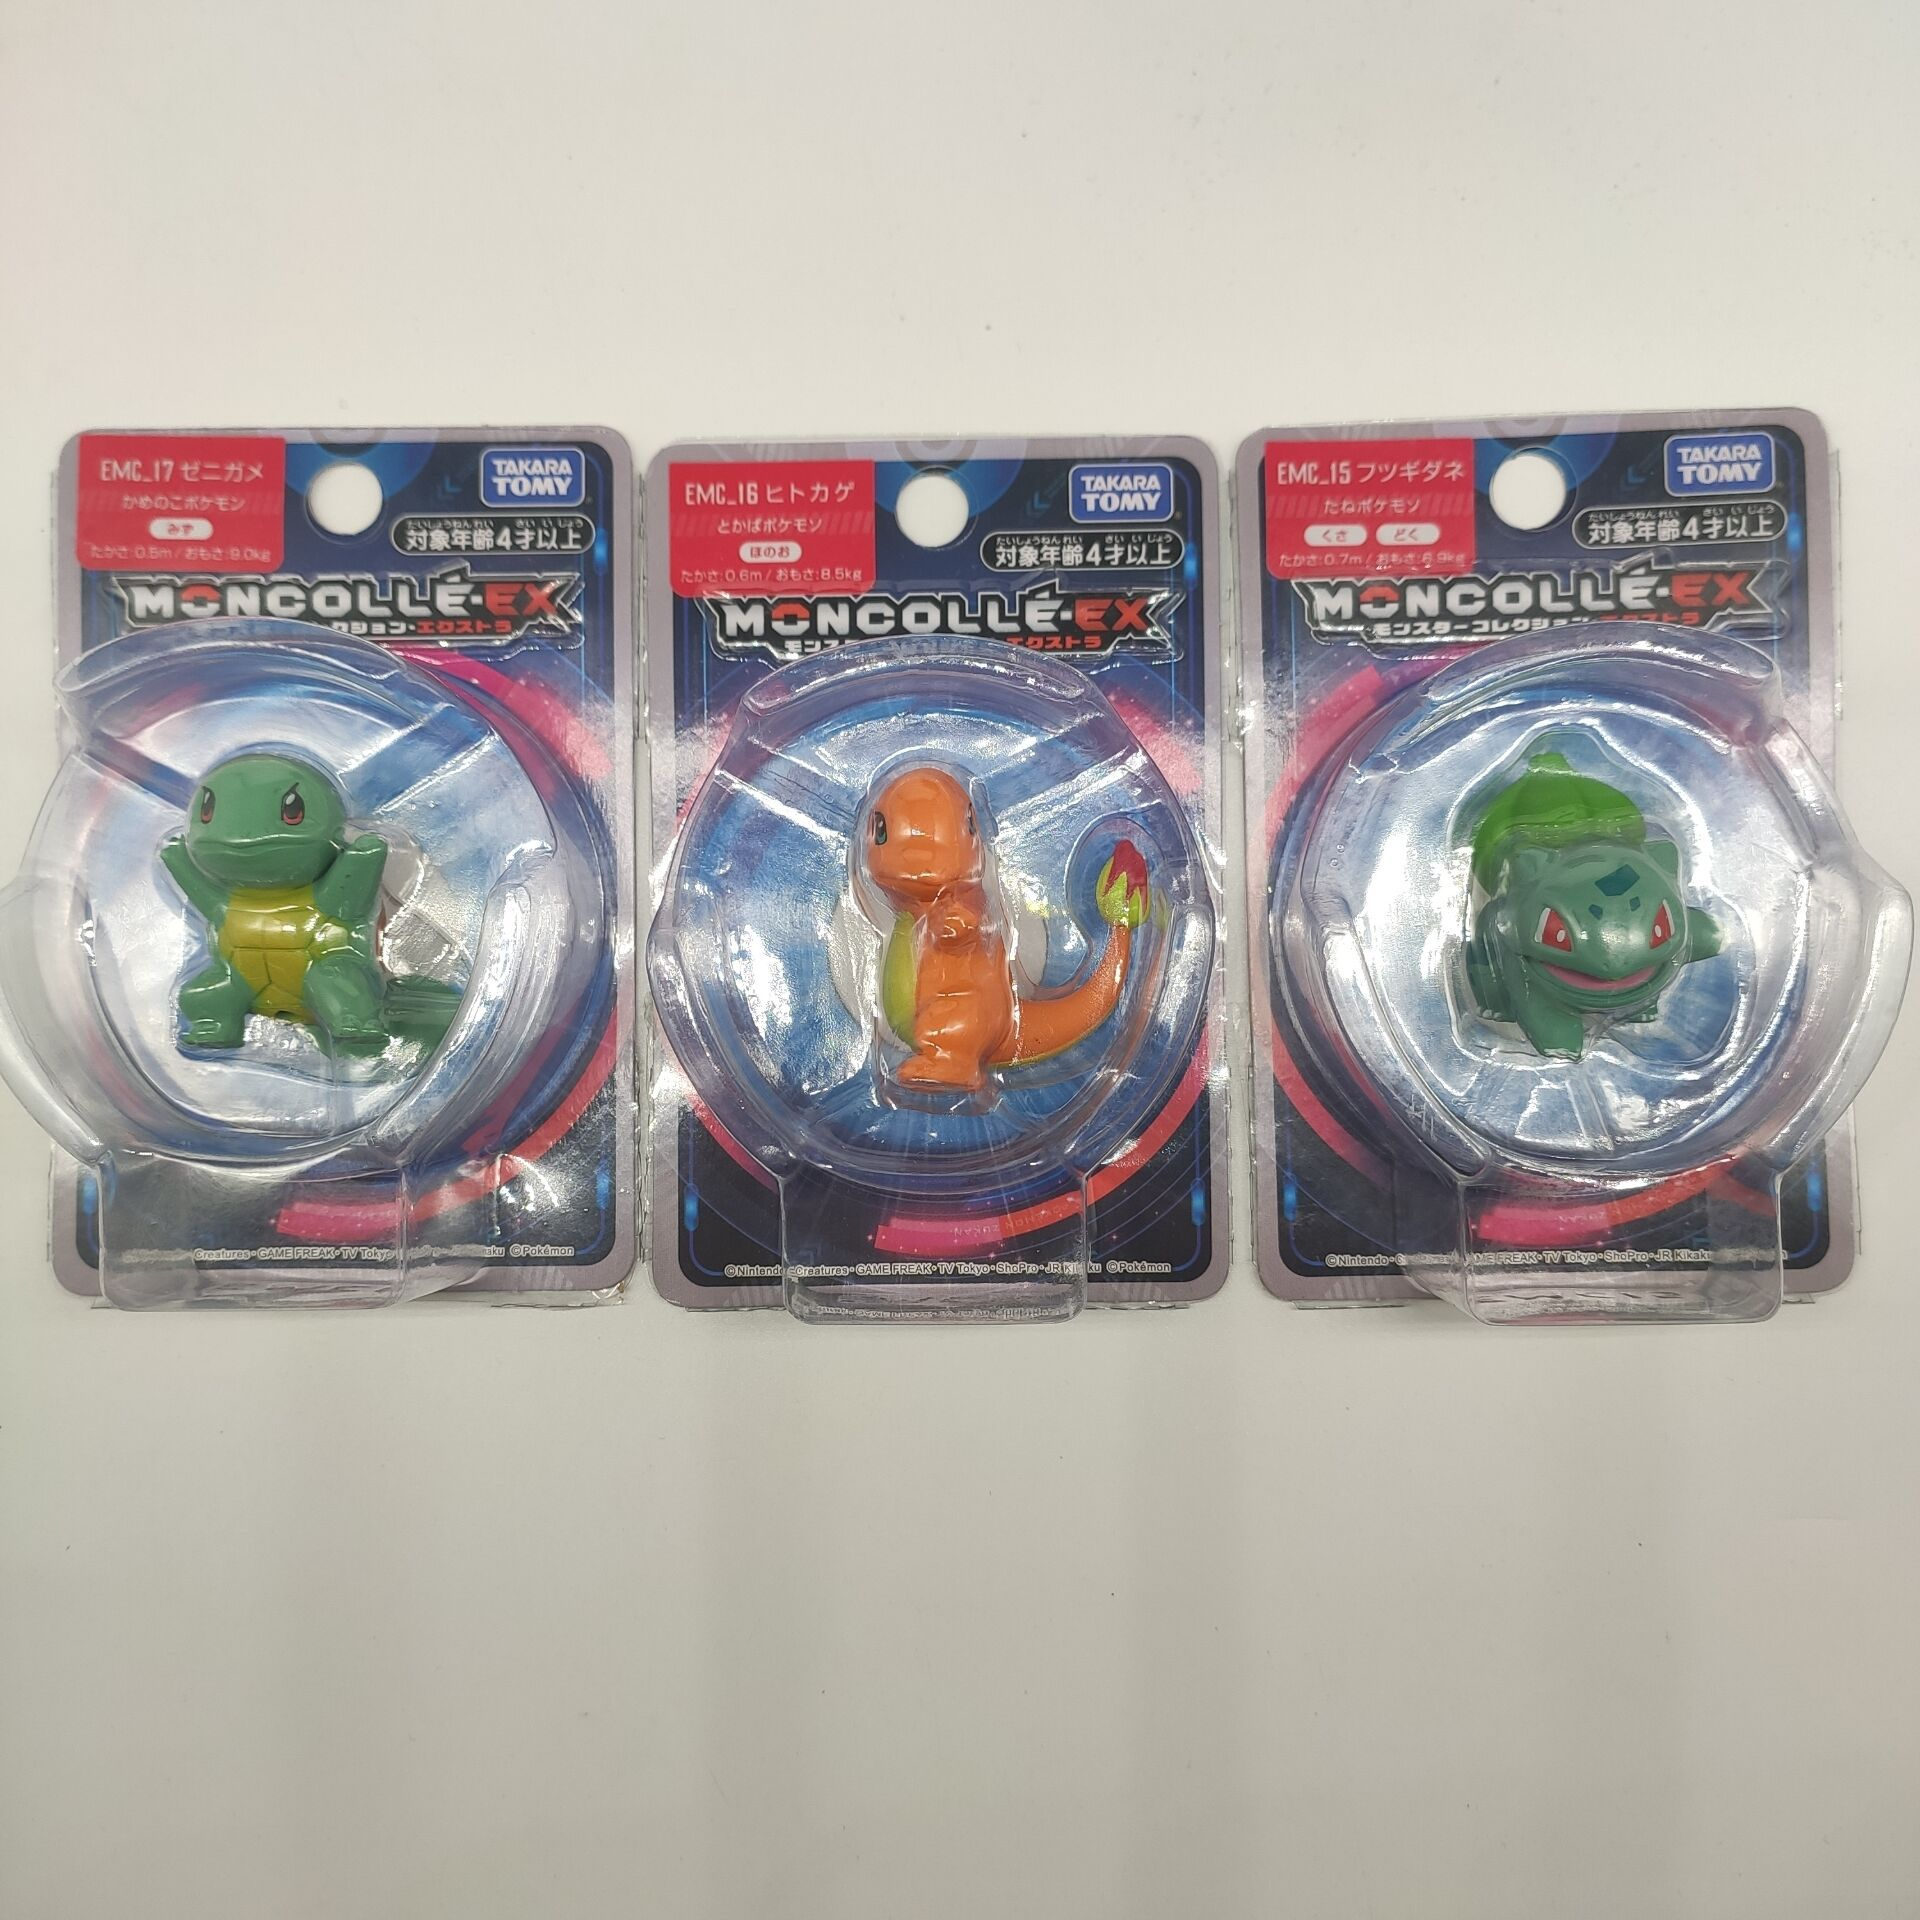 аниме фигурки аниме игрушки Оригинальная кукла Takara Tomy, игрушки для детей, фигурка покемона, игрушки, модель Figuras Pokemon игрушки аниме